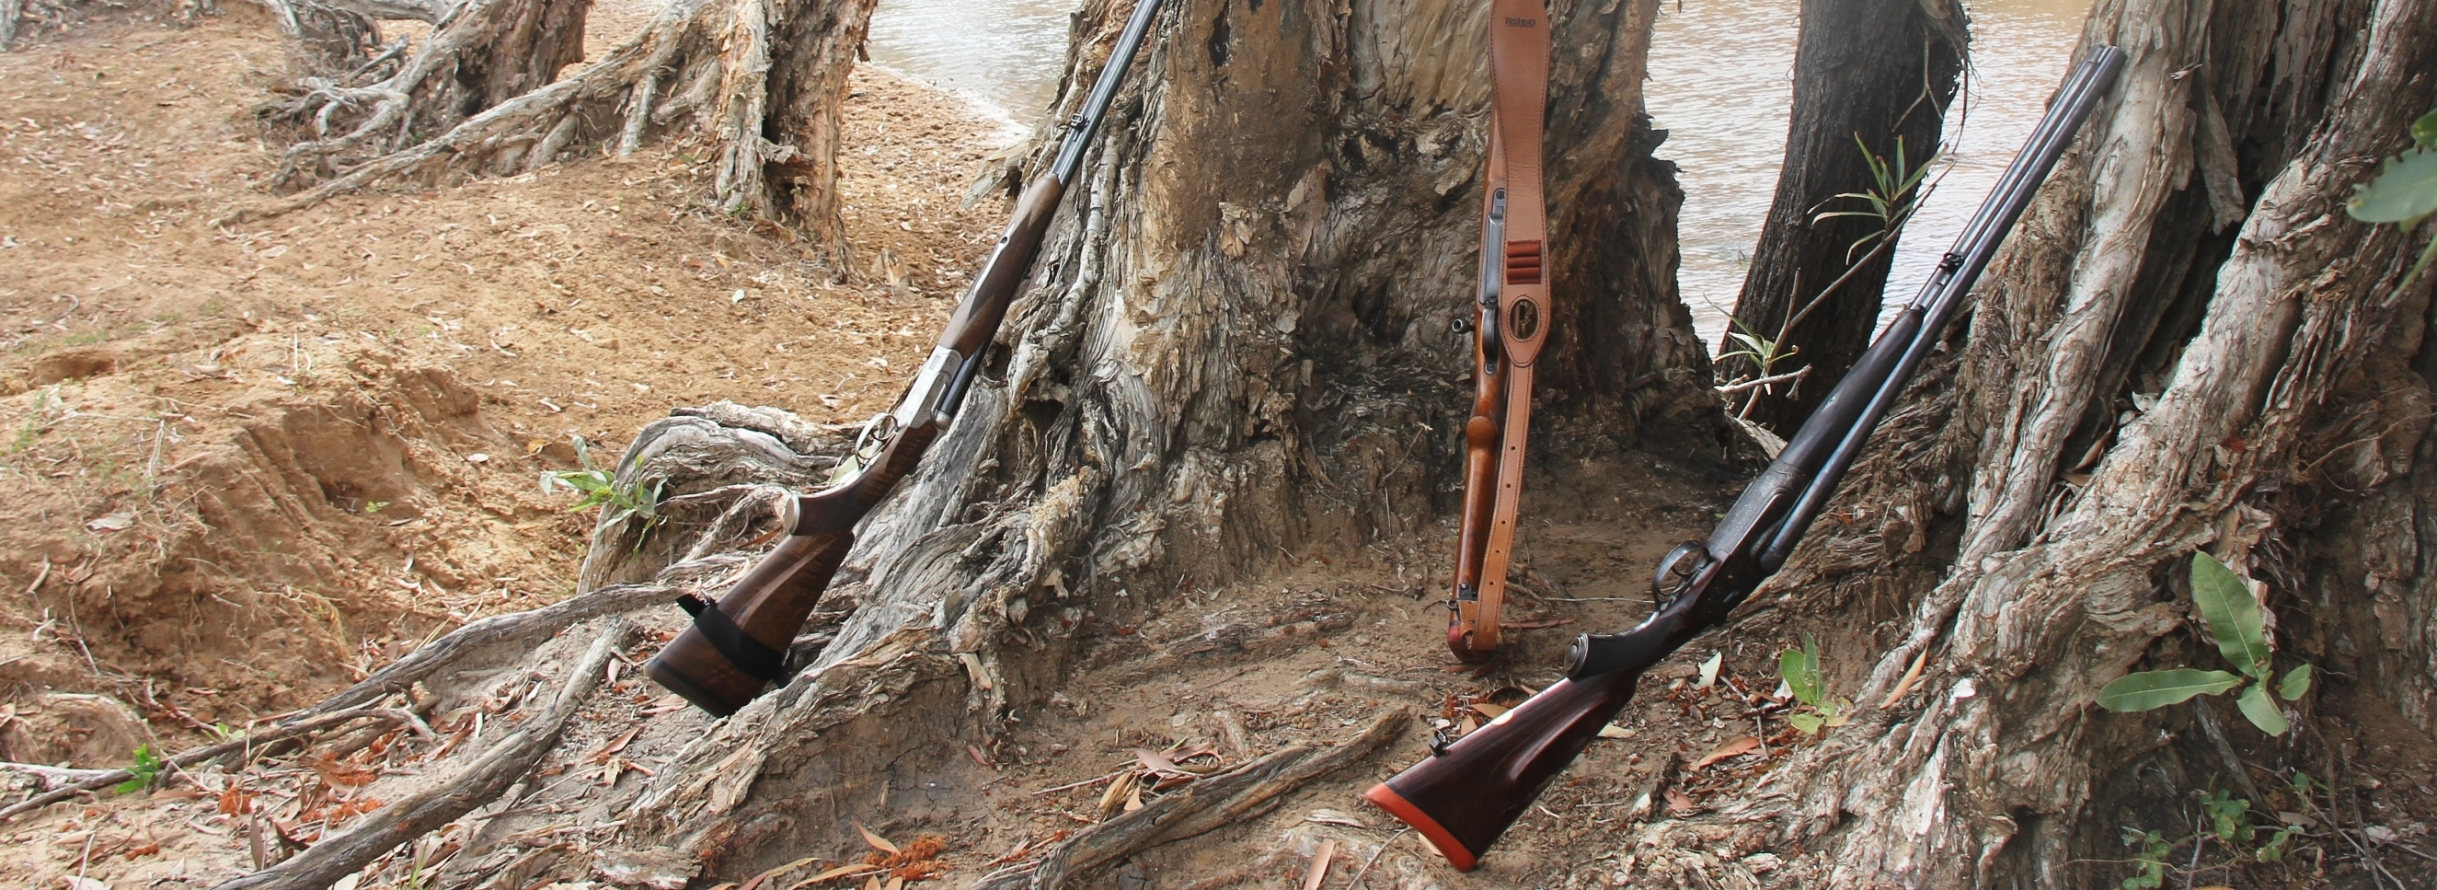 Australian Buffalo Hunters IMG_0014aca.JPG